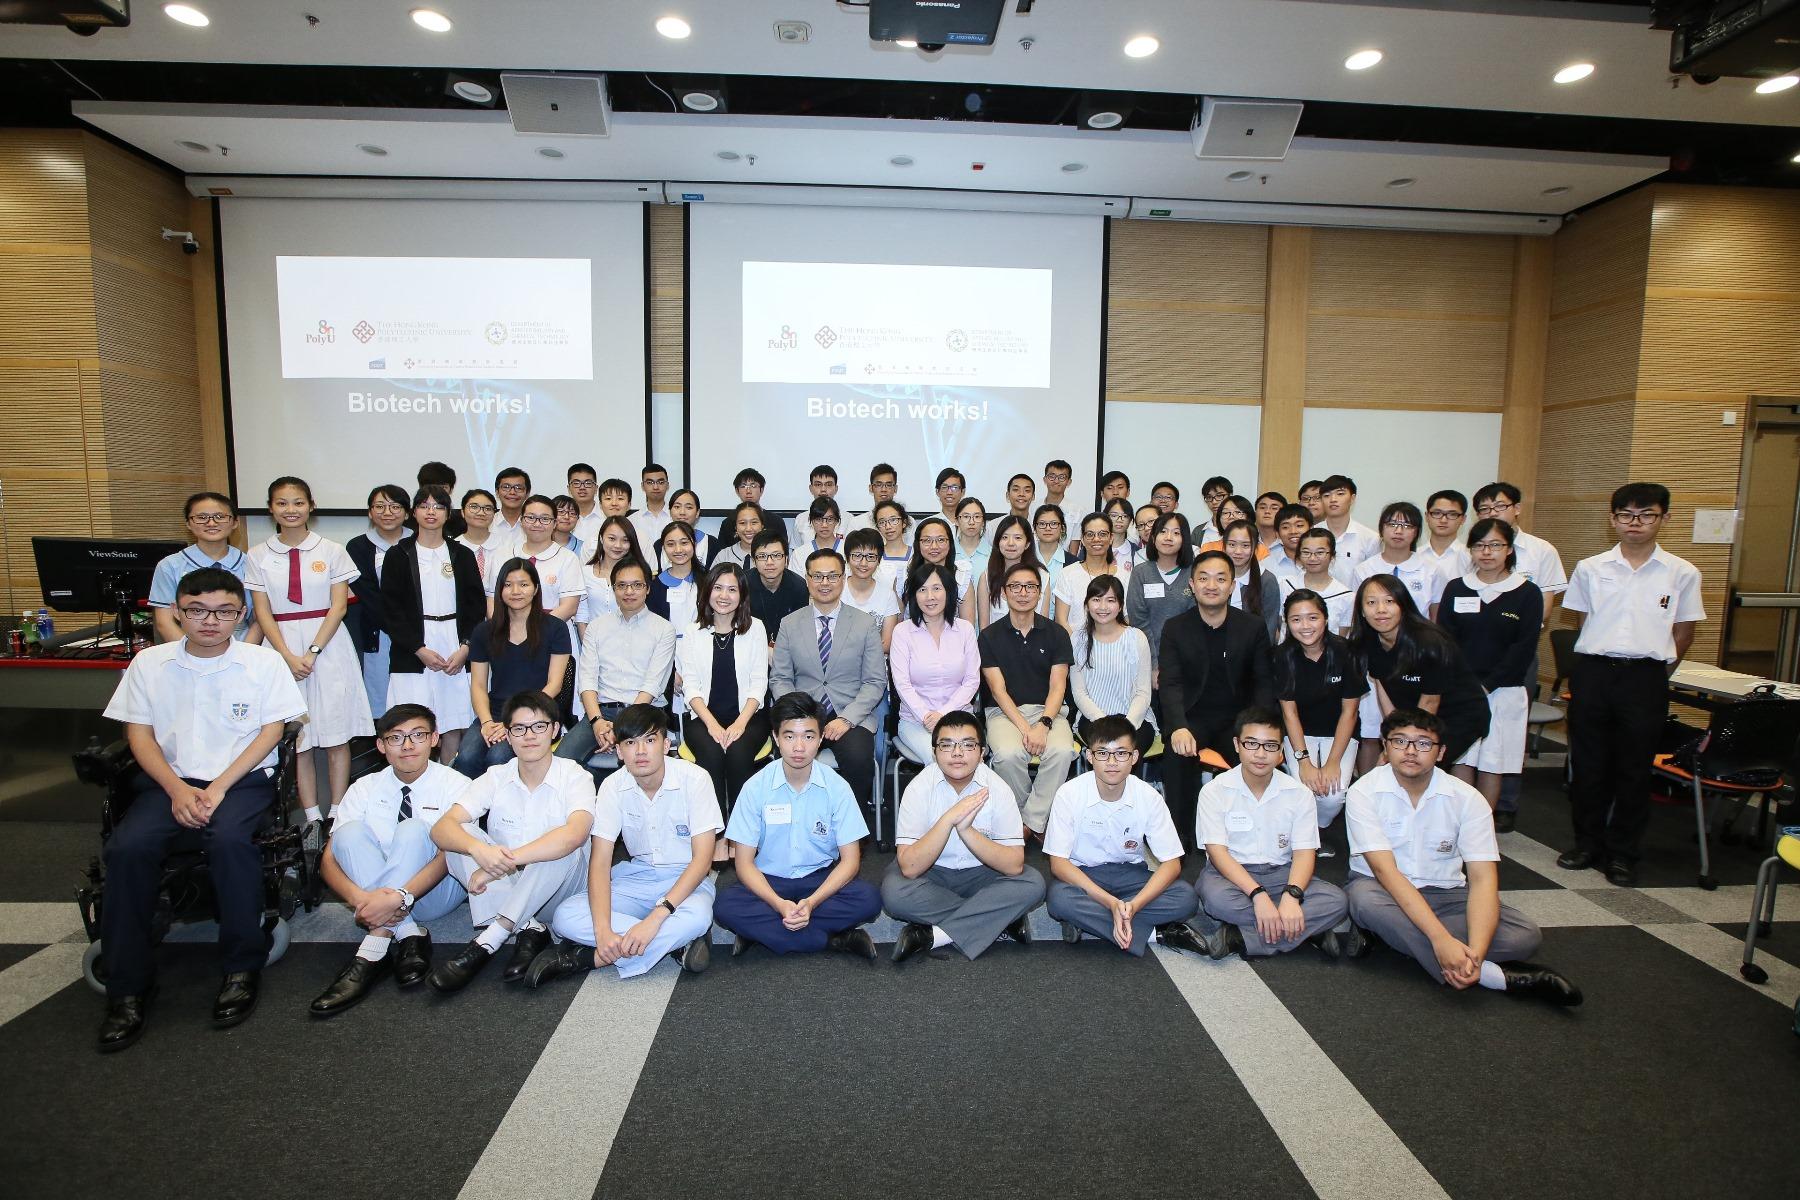 http://www.npc.edu.hk/sites/default/files/img_3468_1.jpg